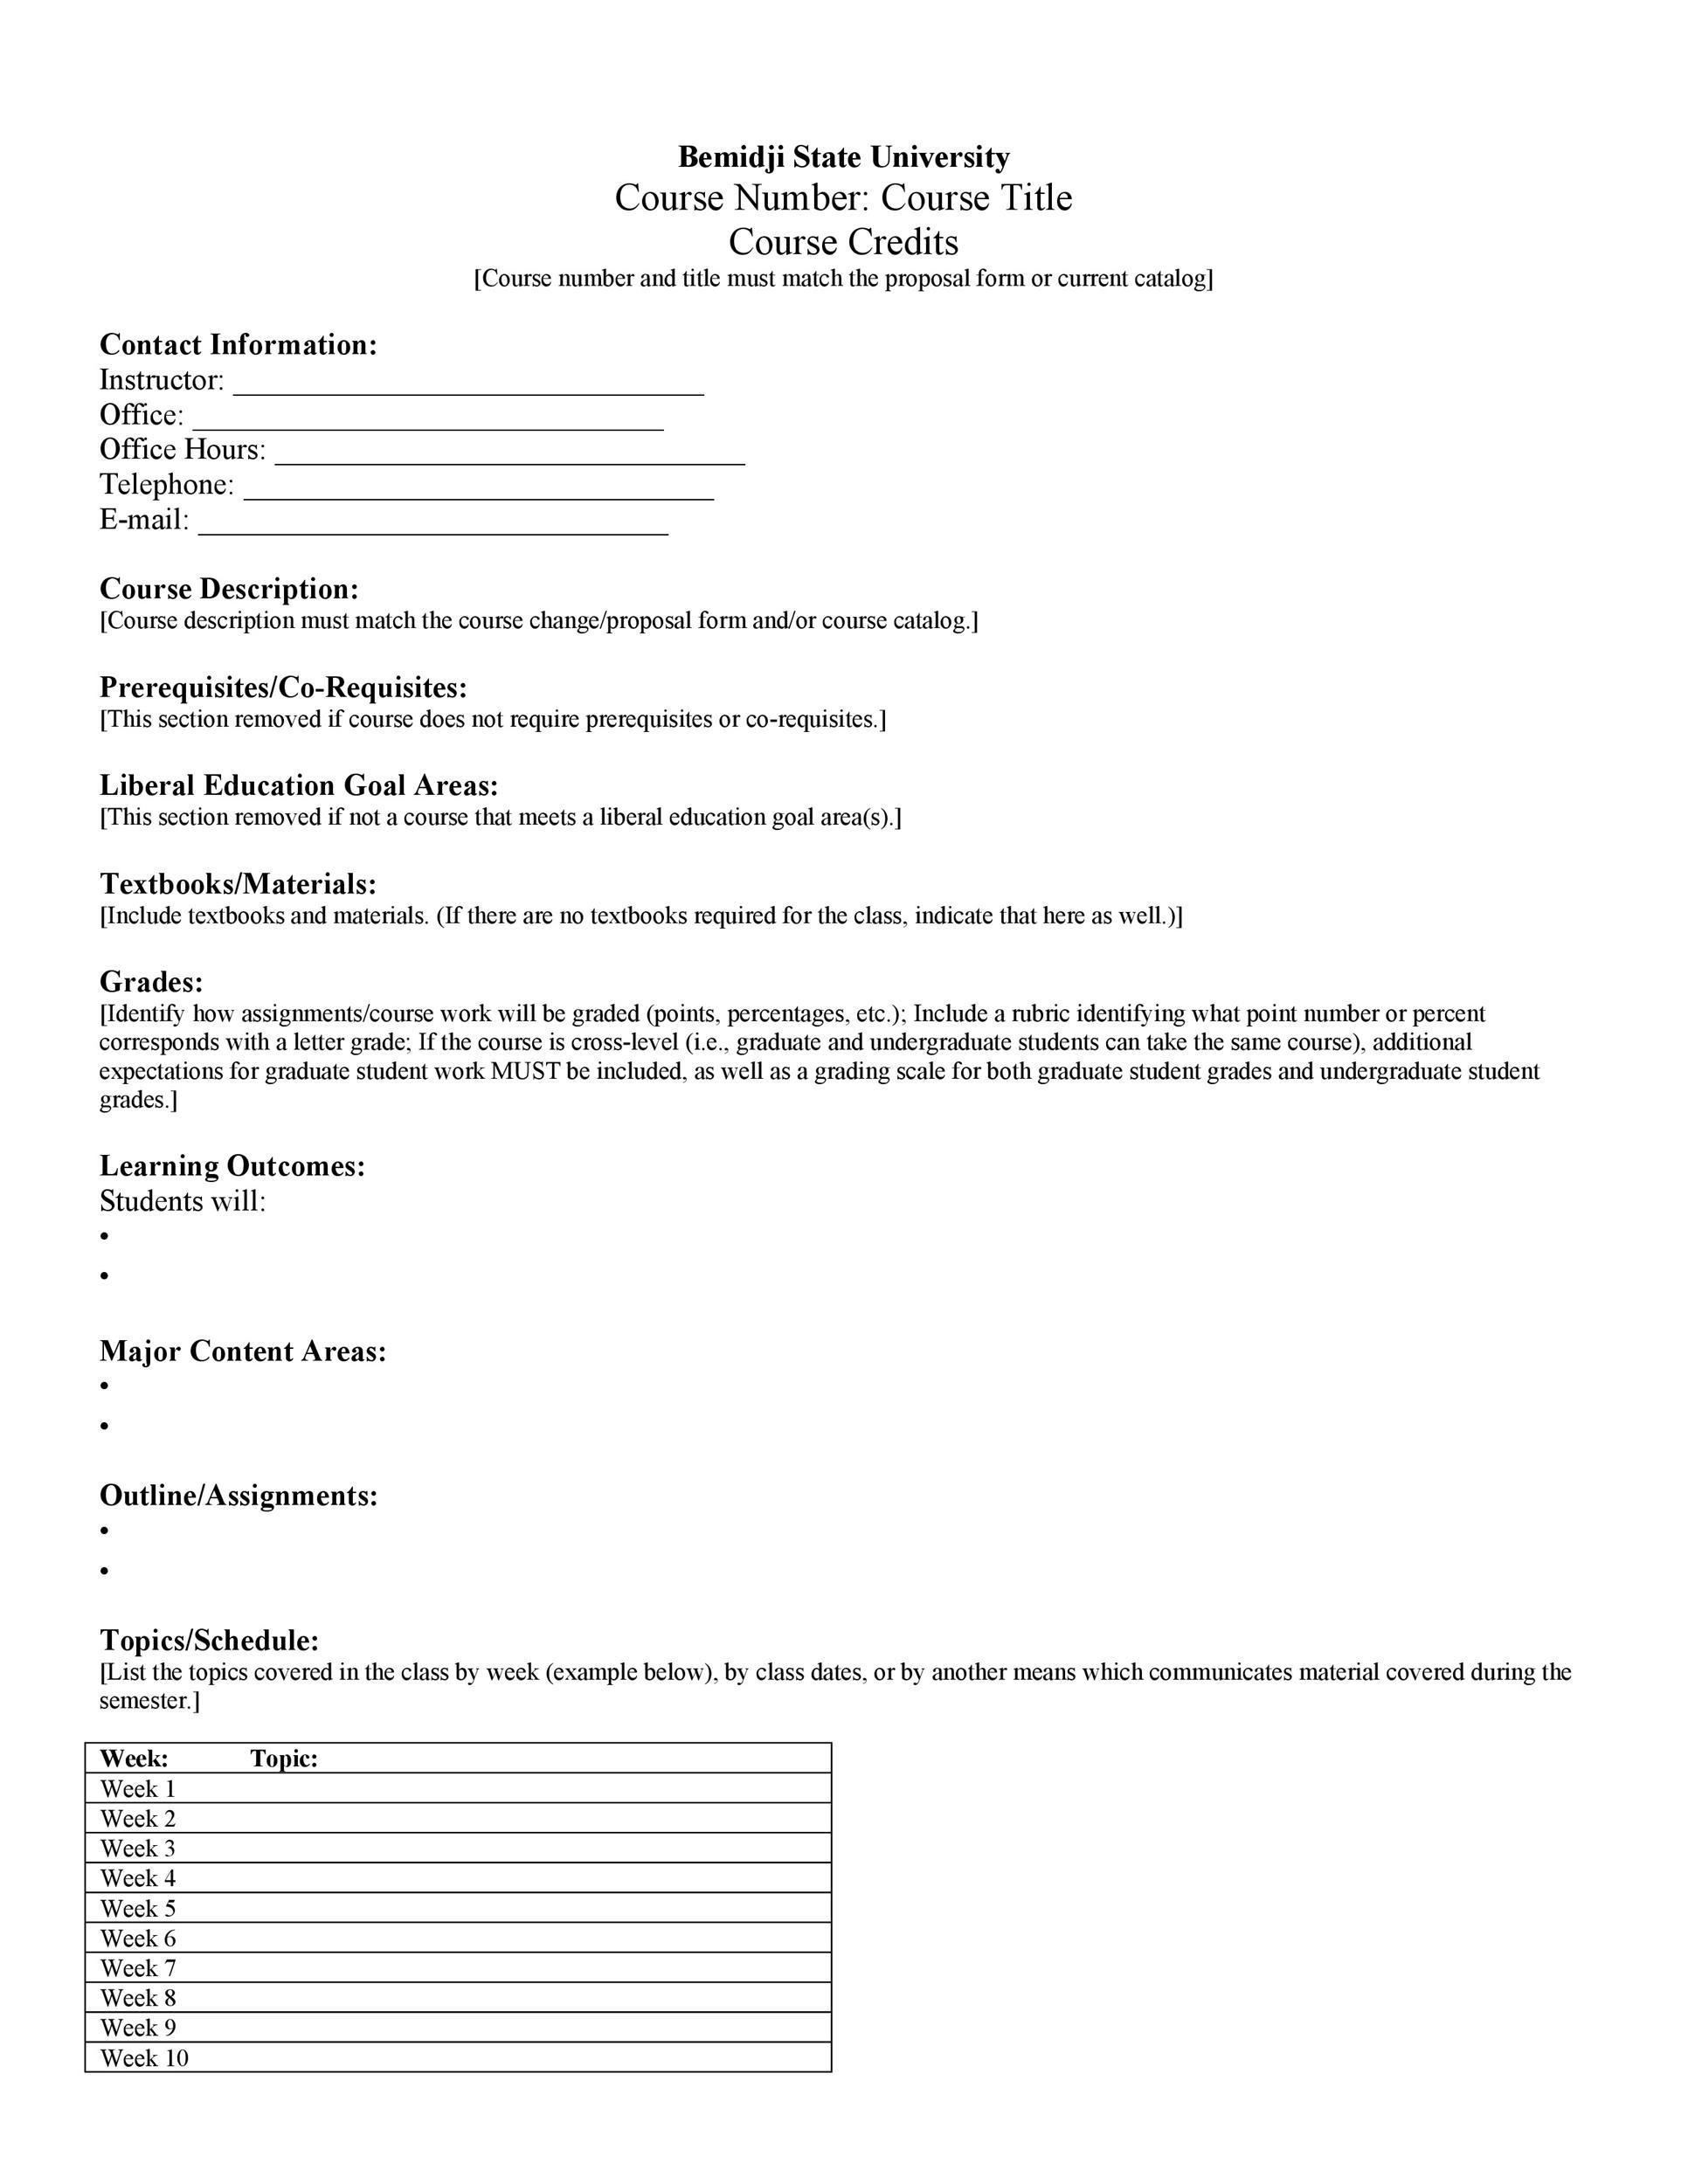 Free sylabus template 43